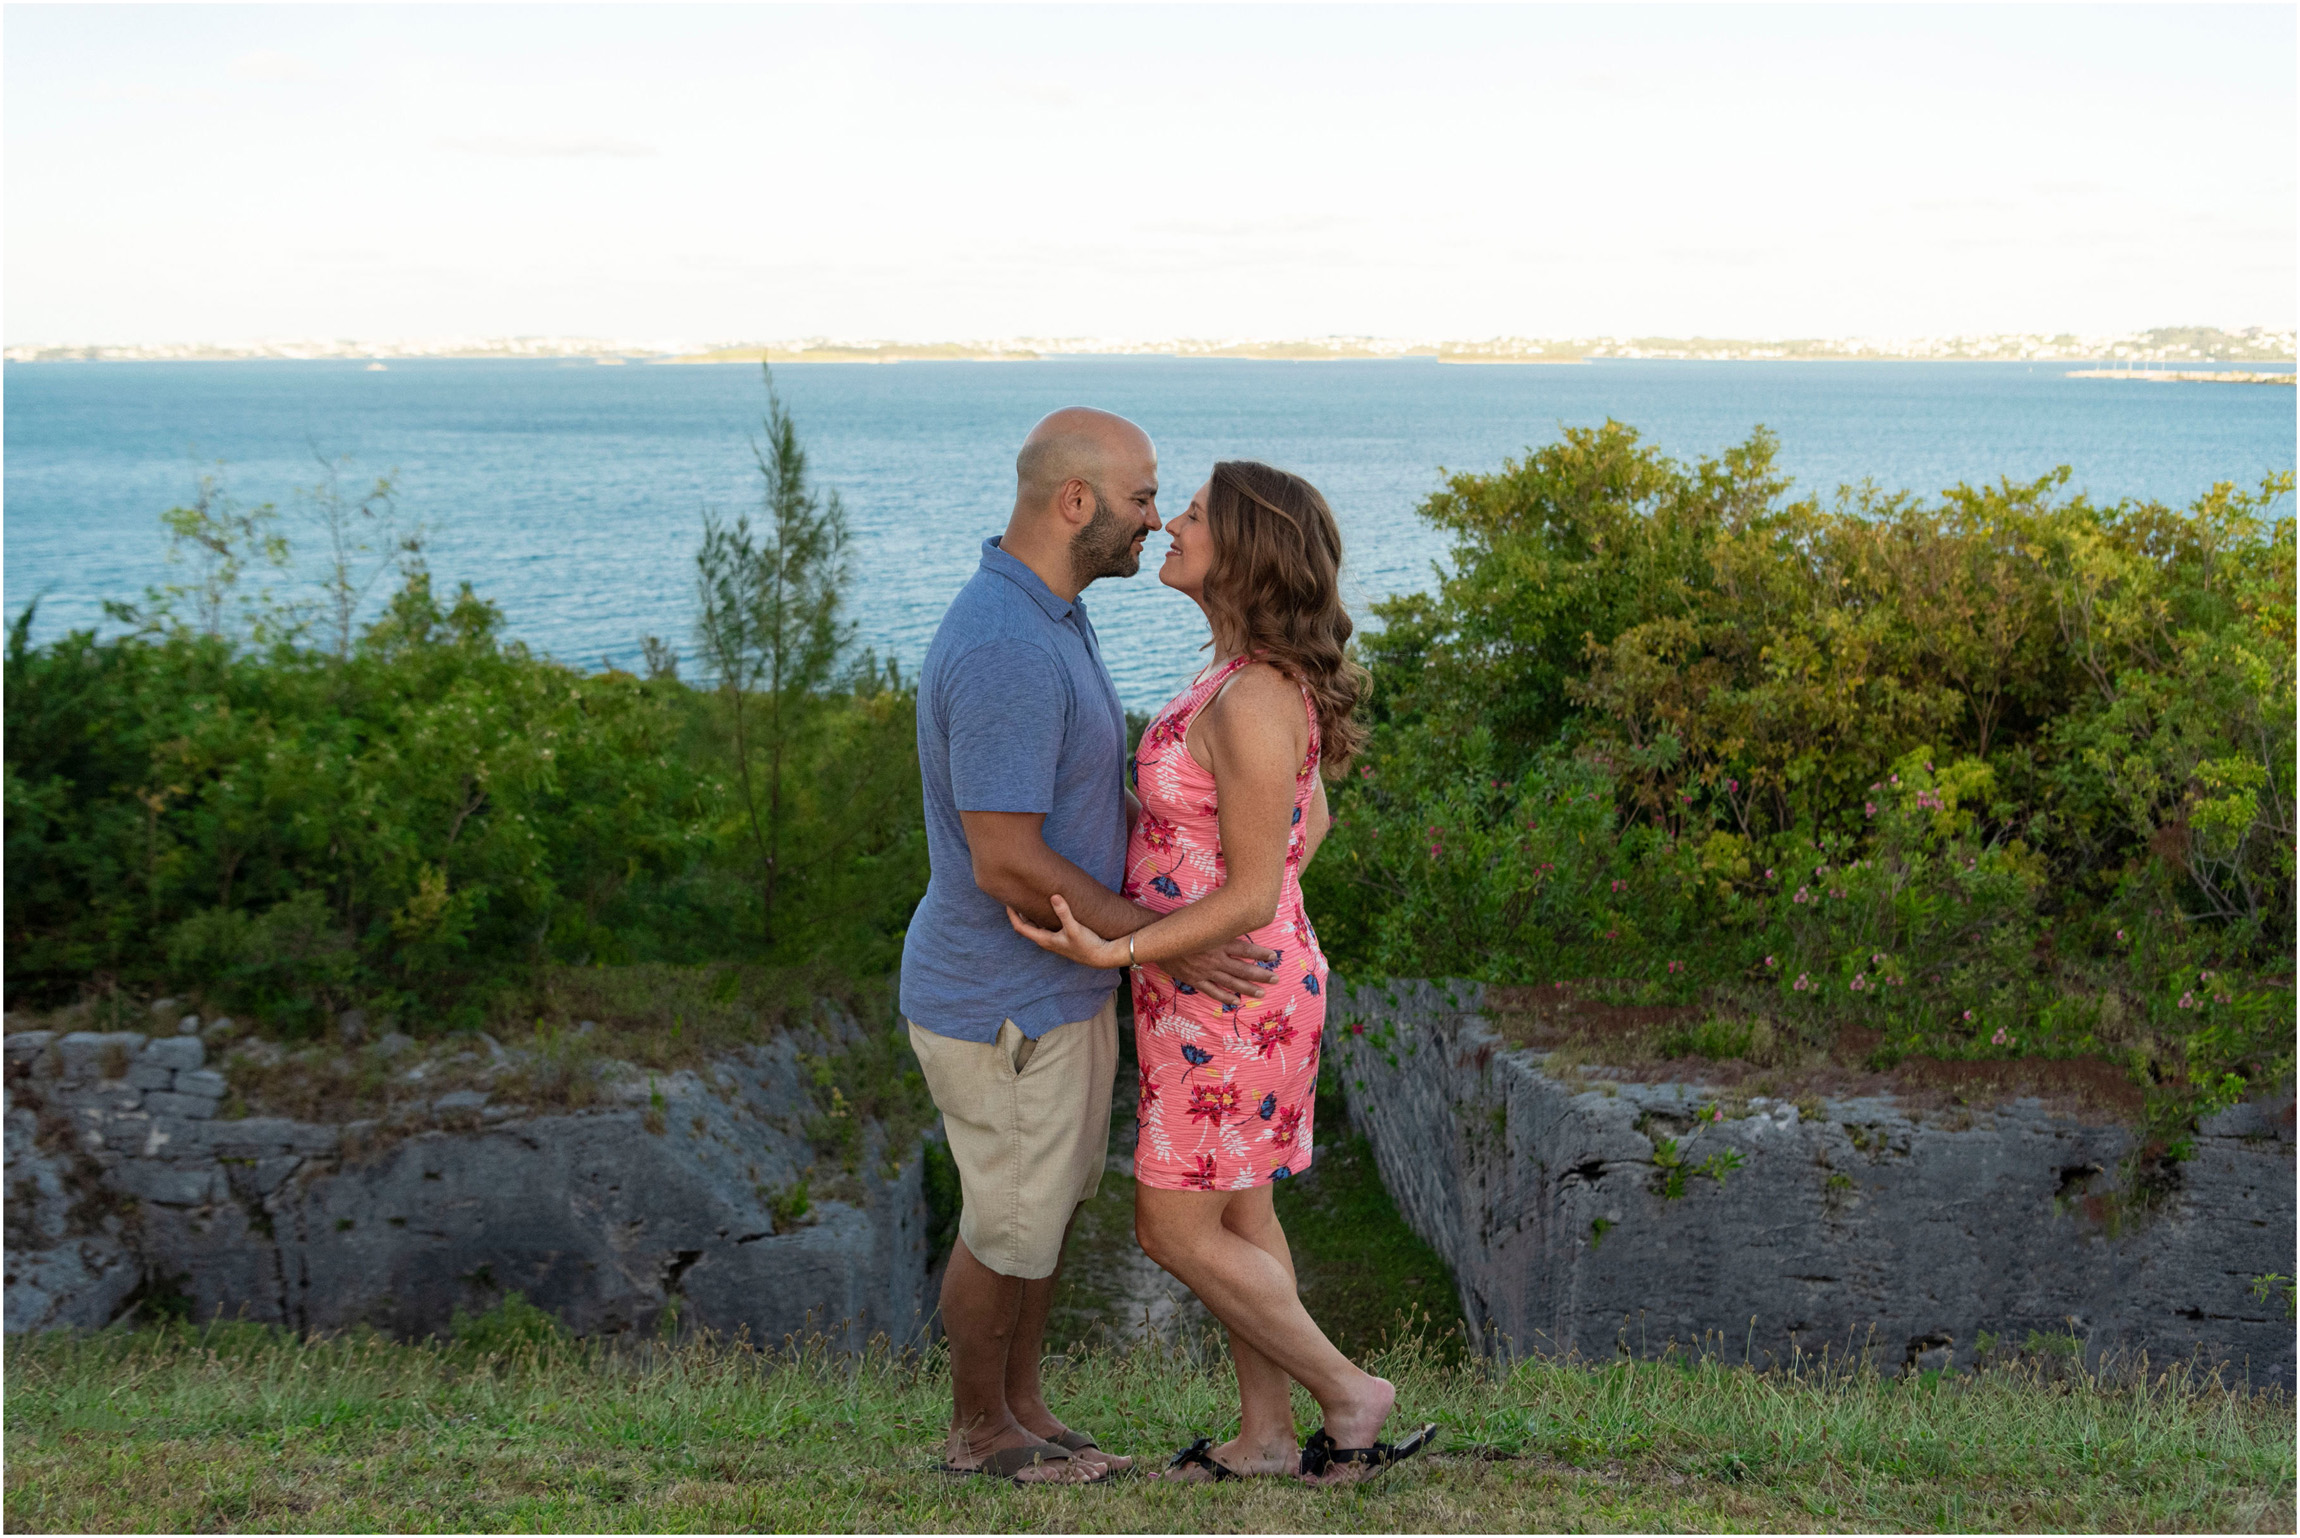 ©FianderFoto_Bermuda Maternity Photographer_Elys Harbour_Ft Scaur_Airbnb_Victoria_Mike_017.jpg